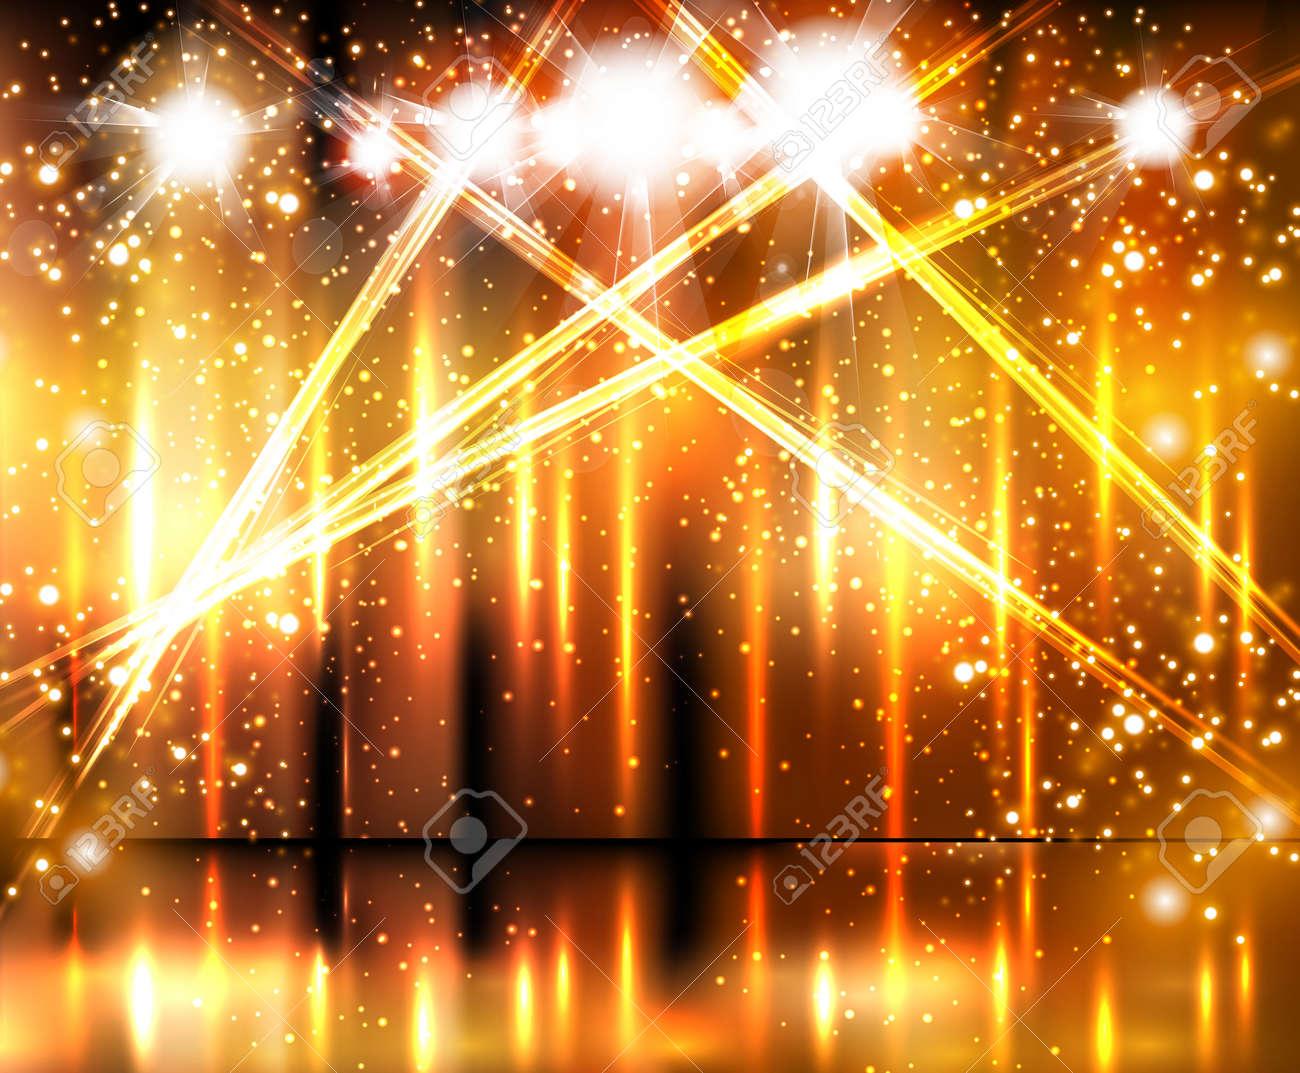 light stage background - 22717233